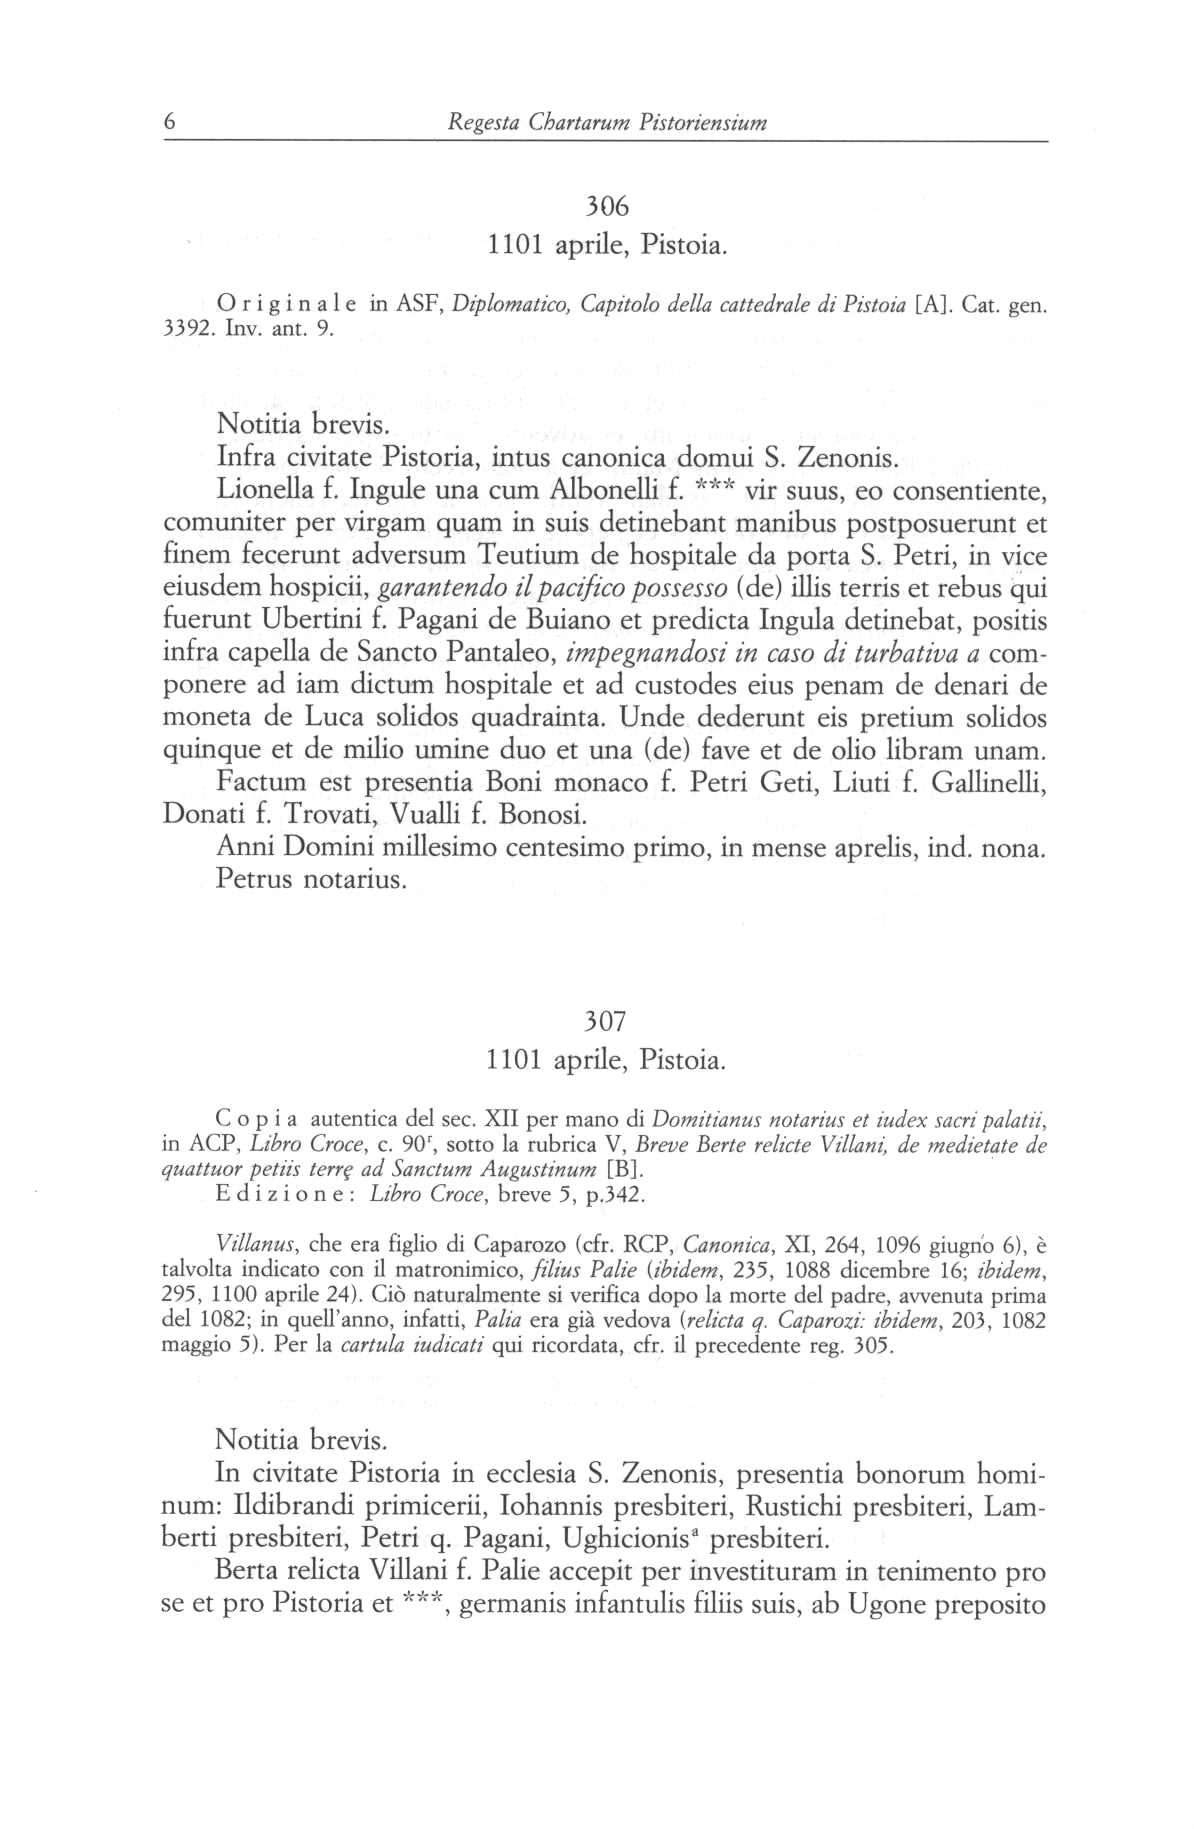 Canonica S. Zenone XII 0006.jpg